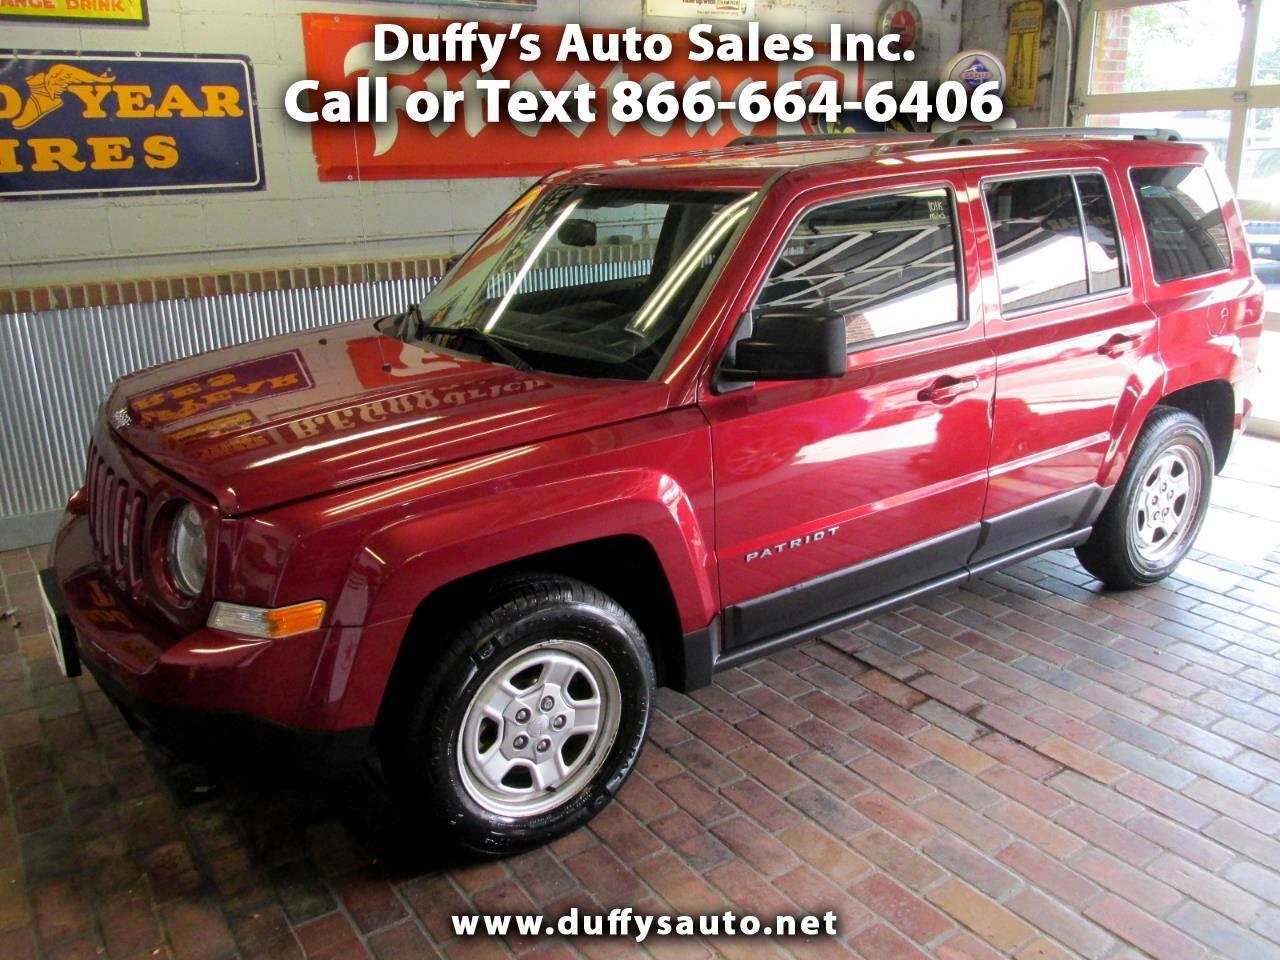 Used 2016 Jeep Patriot Fwd 4dr Sport For Sale In Peru Il 61354 Duffy S Auto Sales Inc